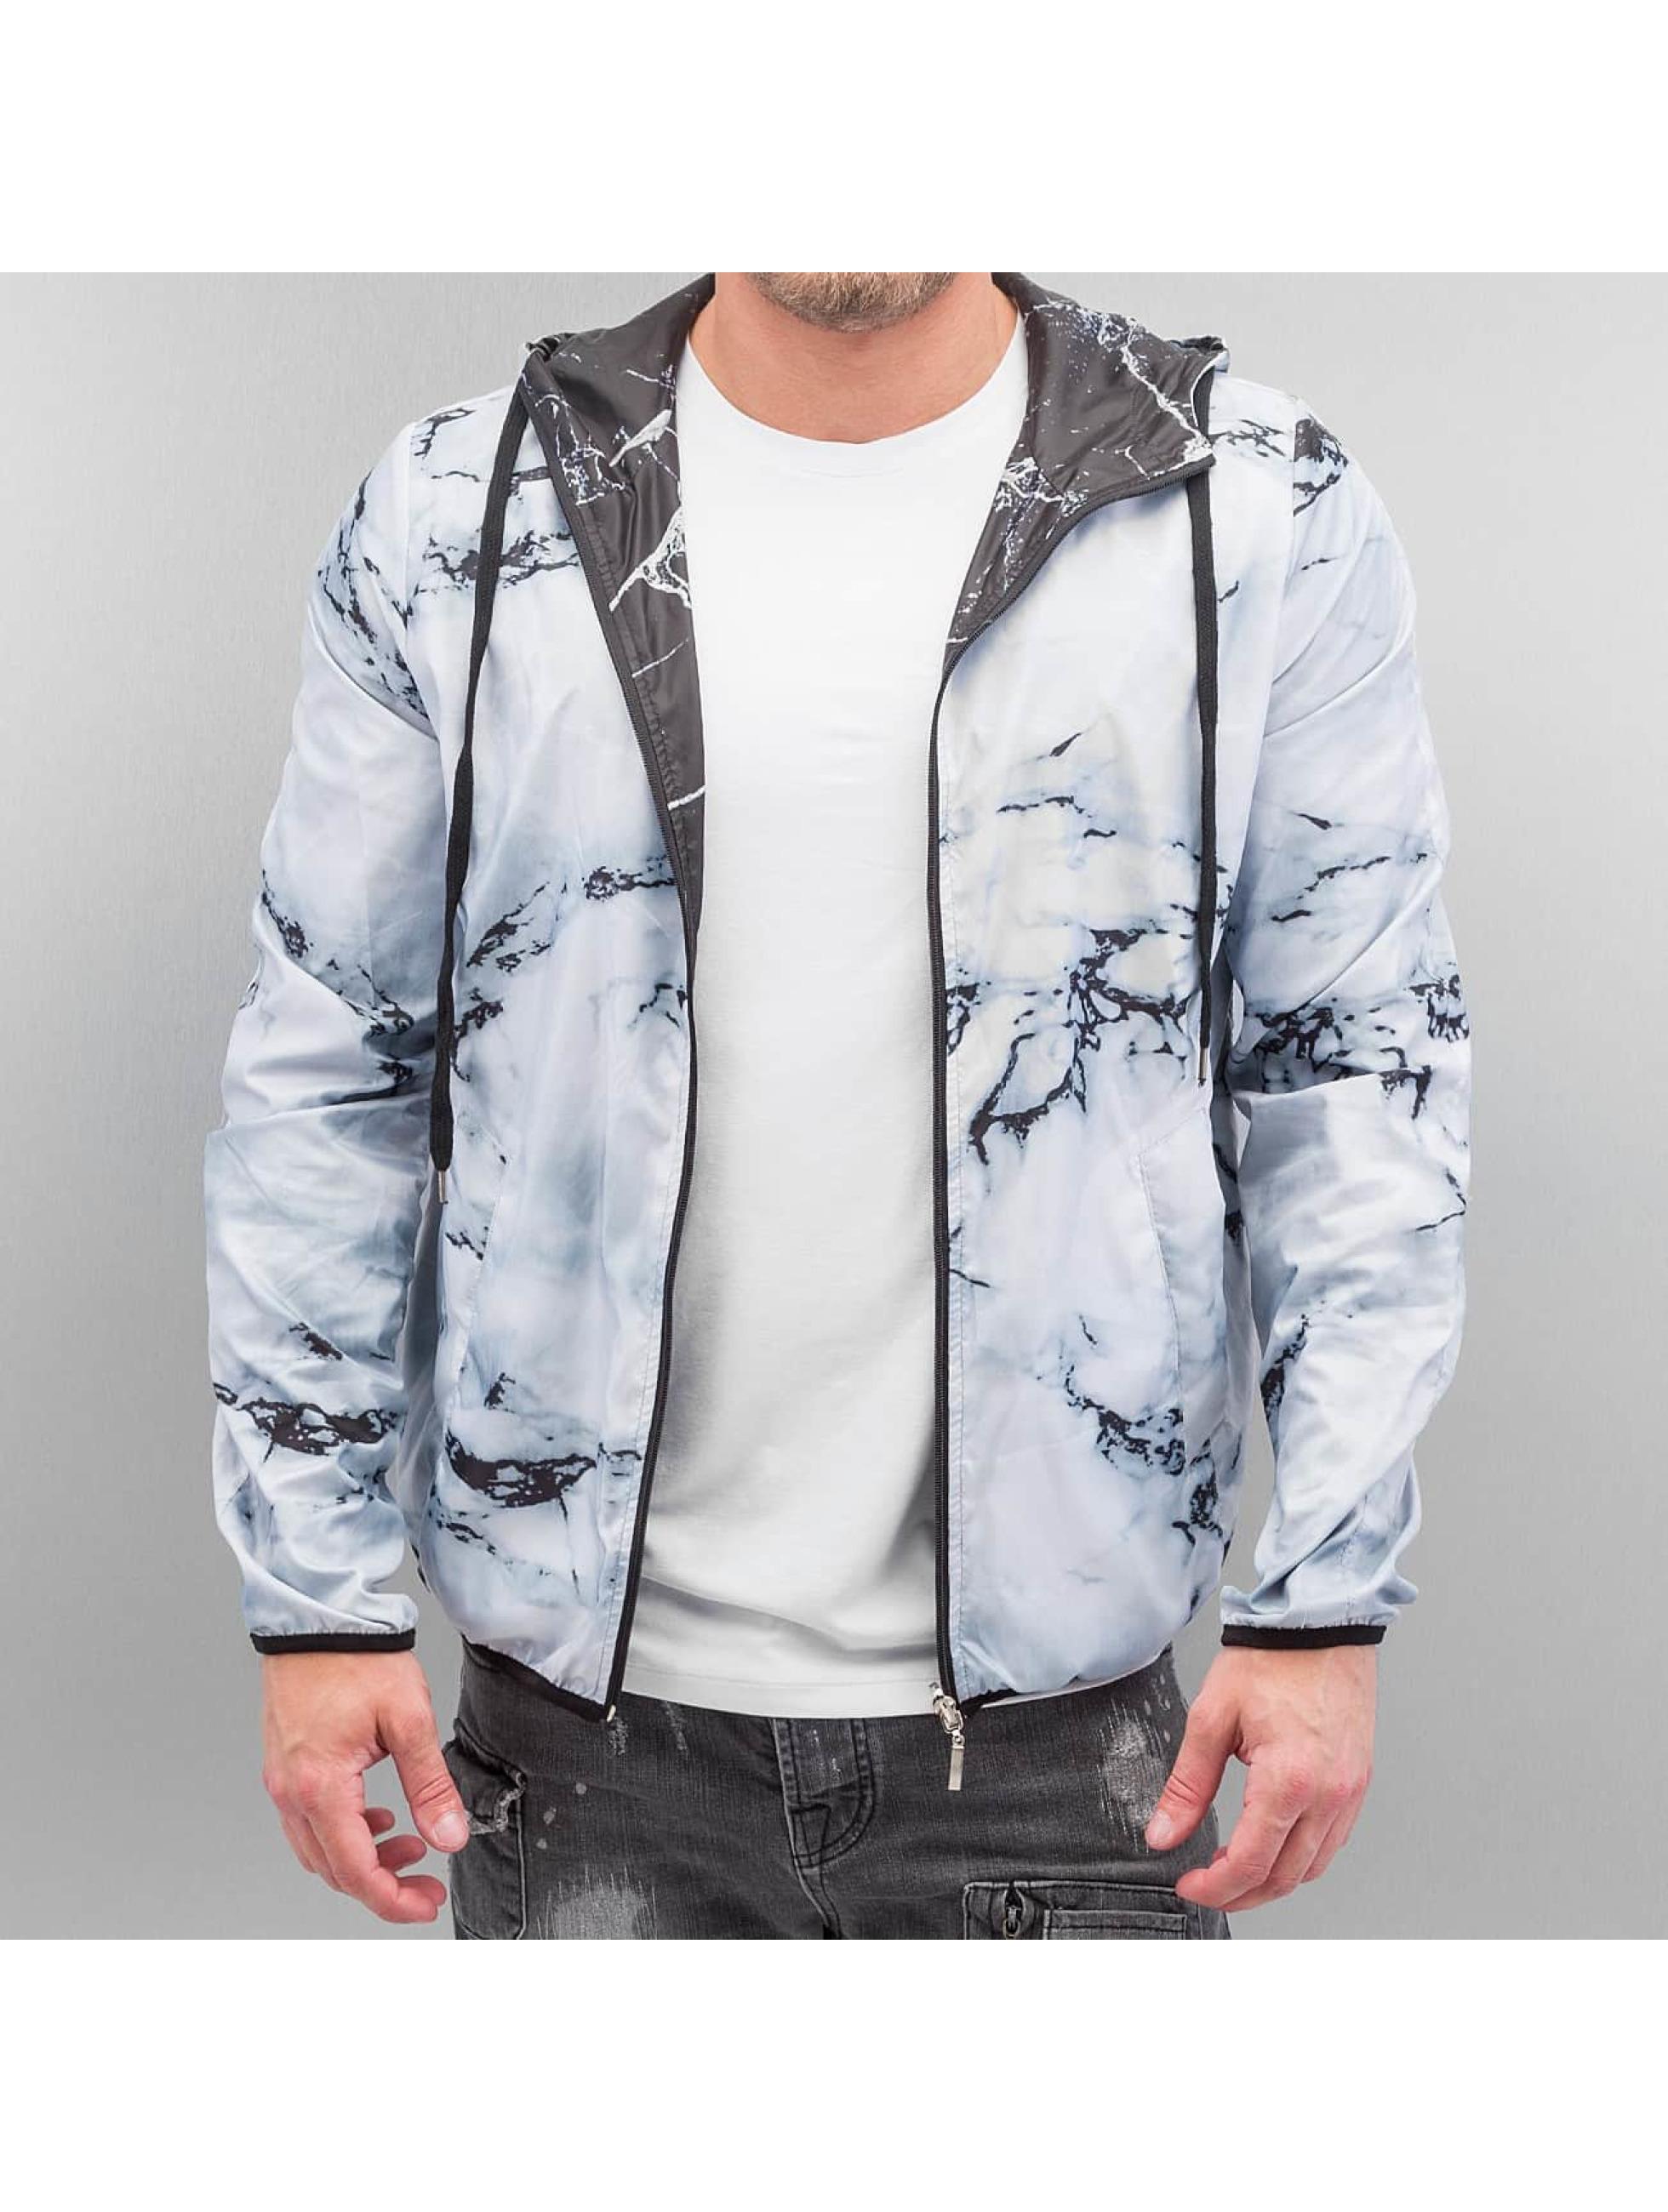 VSCT Clubwear Демисезонная куртка Marble 2in1 Reversible черный